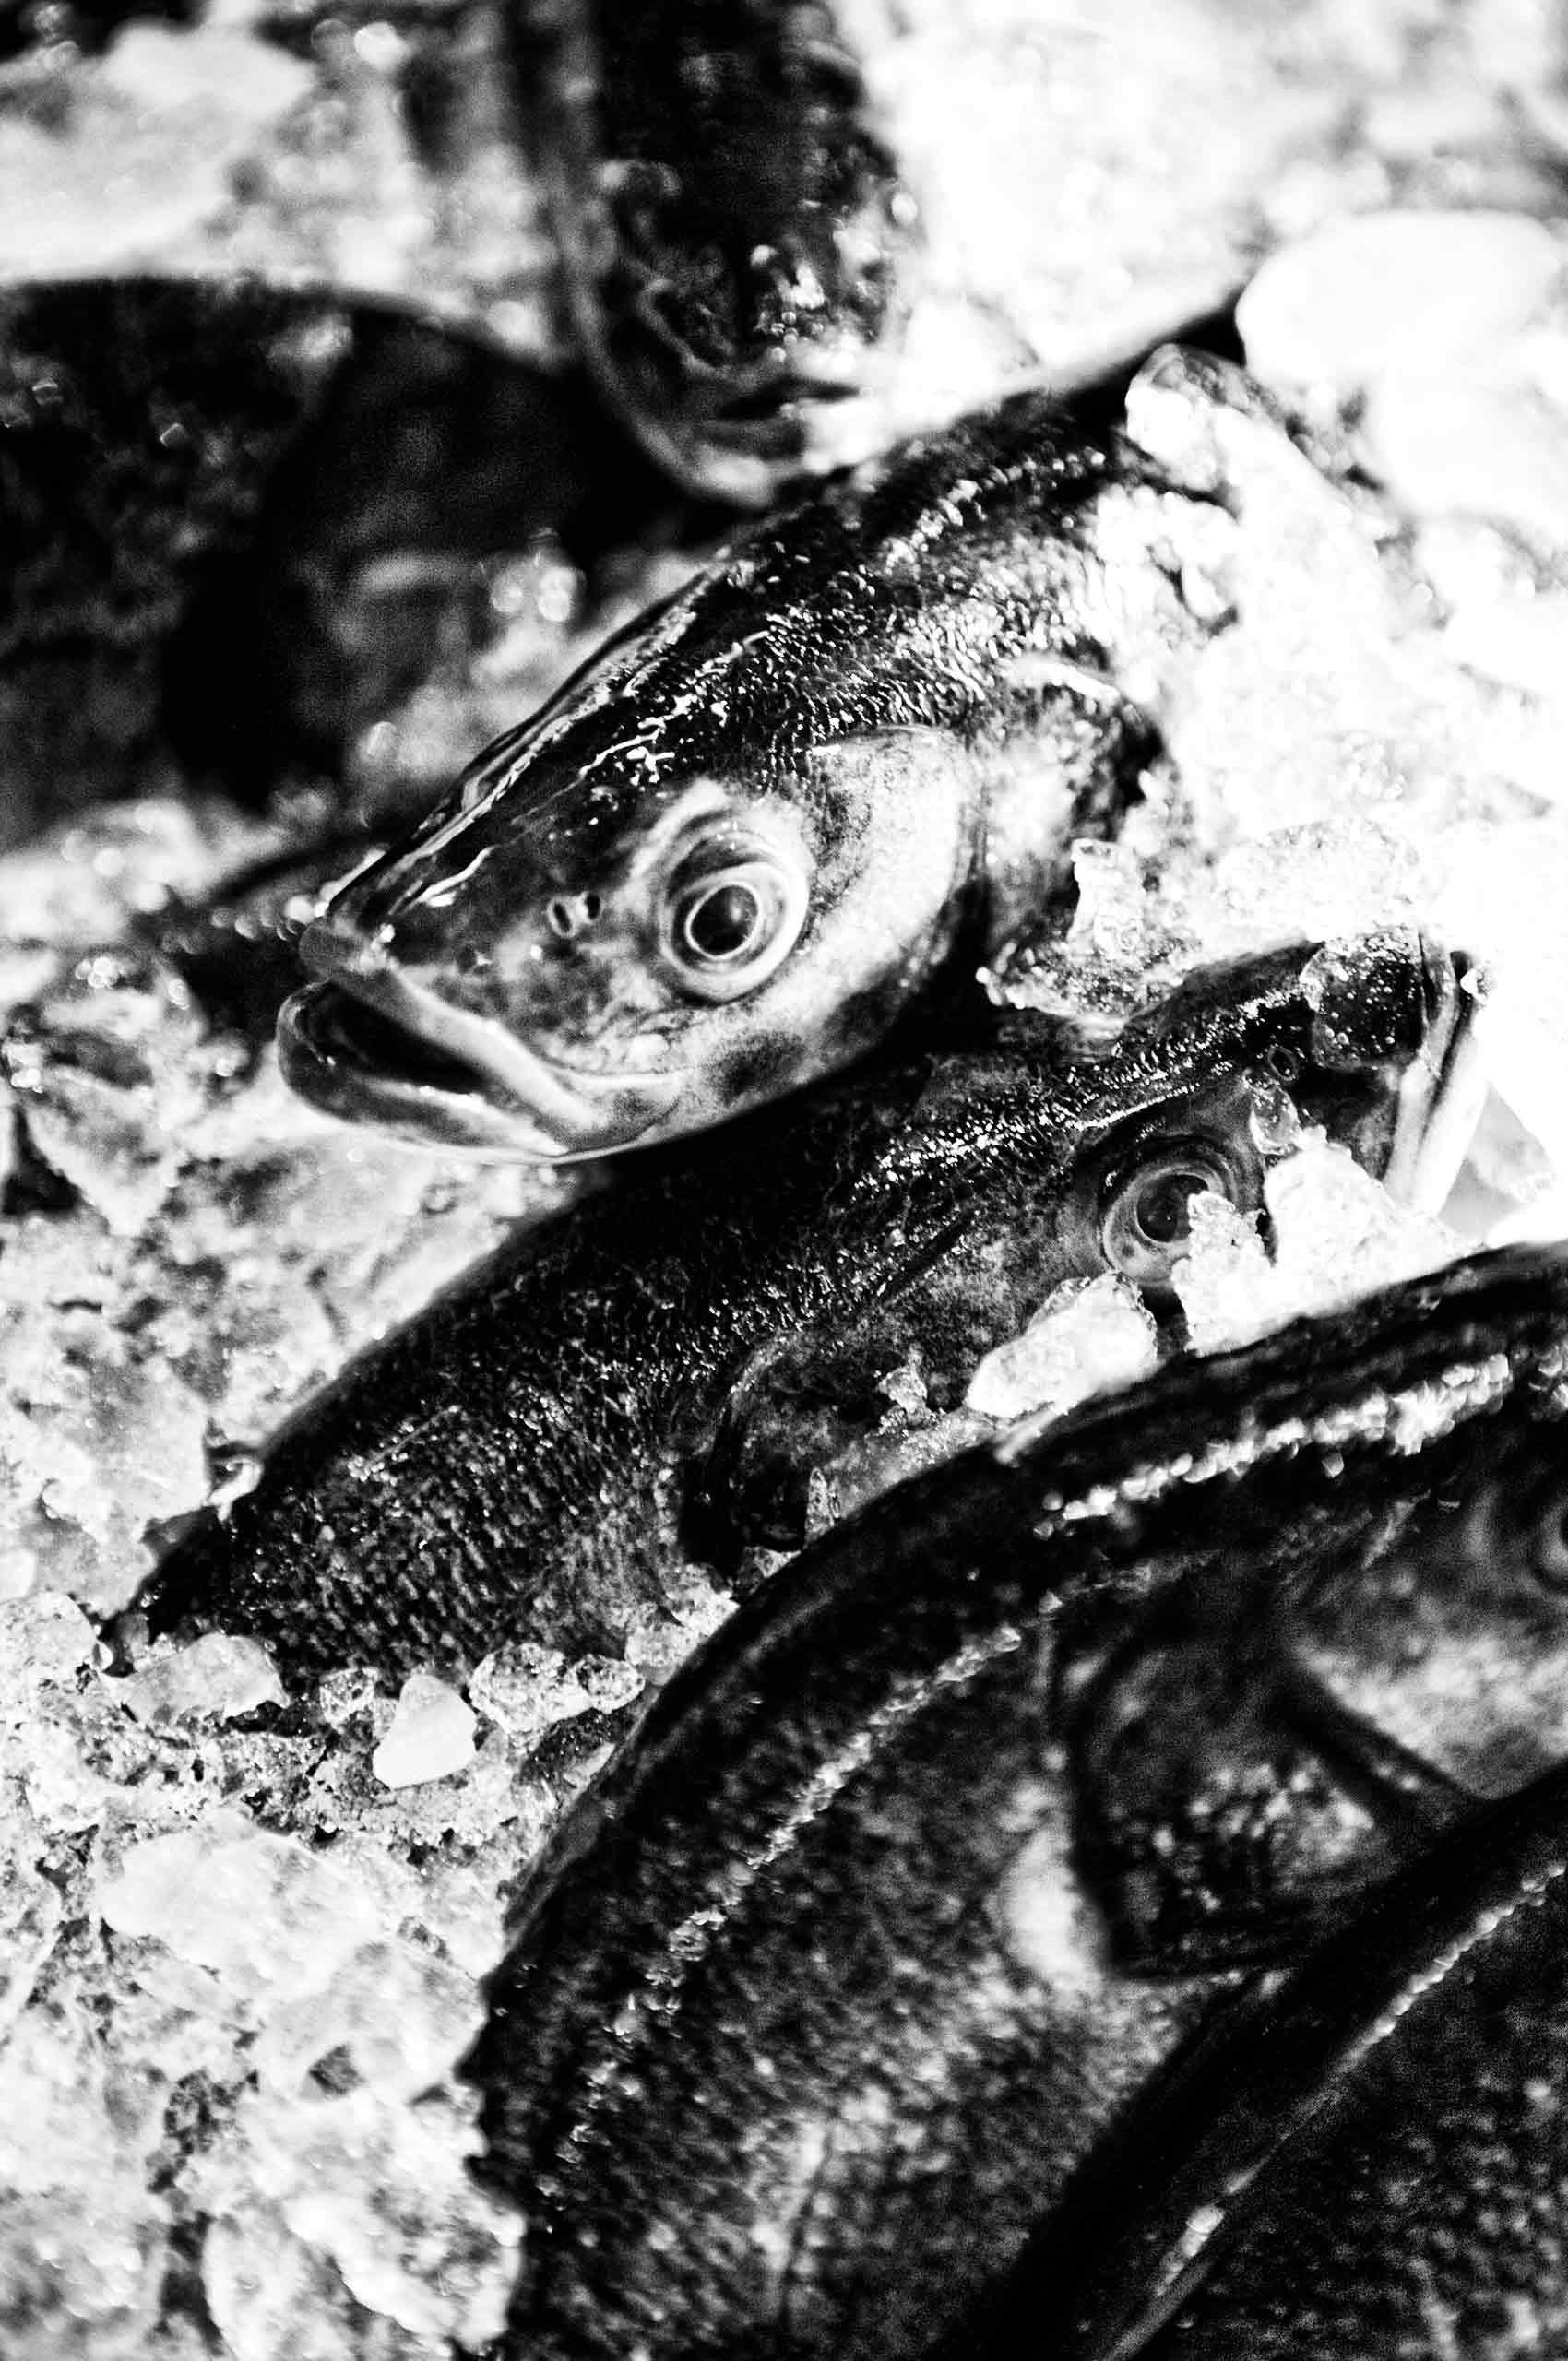 Fish-StillLife-RealLife-by-HenrikOlundPhotography.jpg